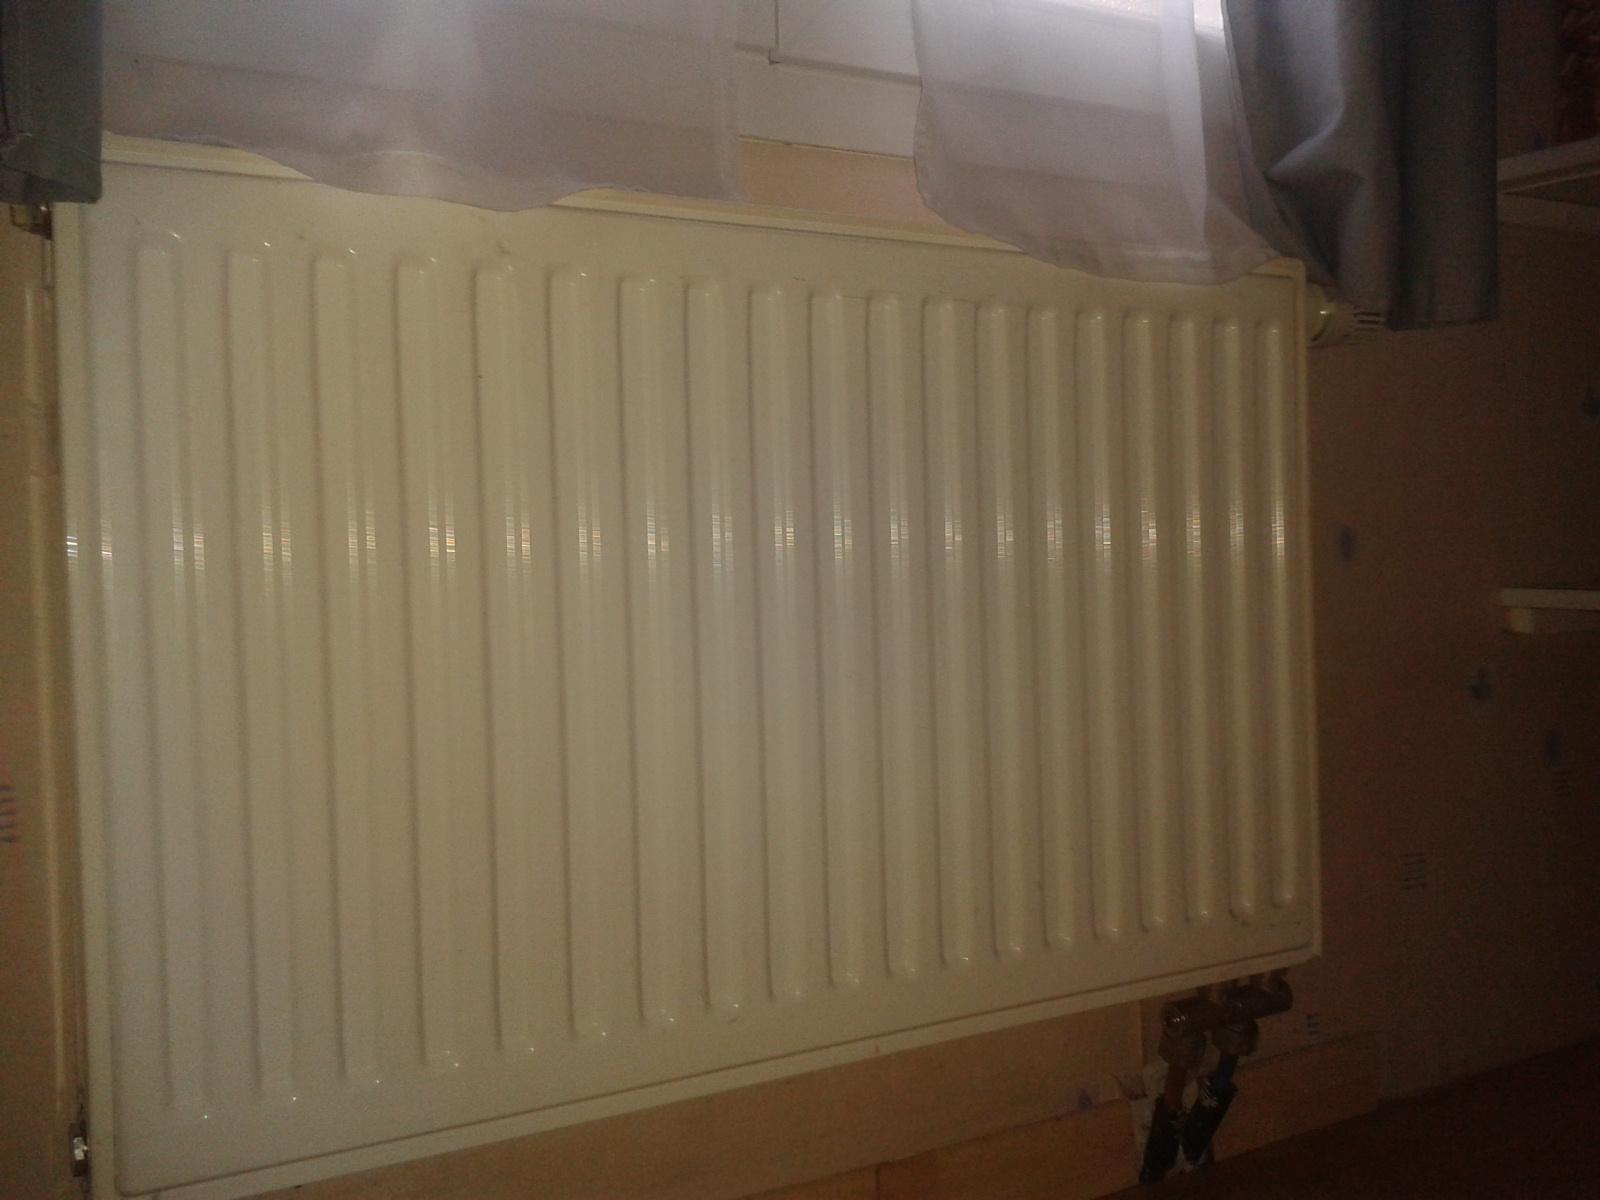 fuite radiateur a gaz. Black Bedroom Furniture Sets. Home Design Ideas